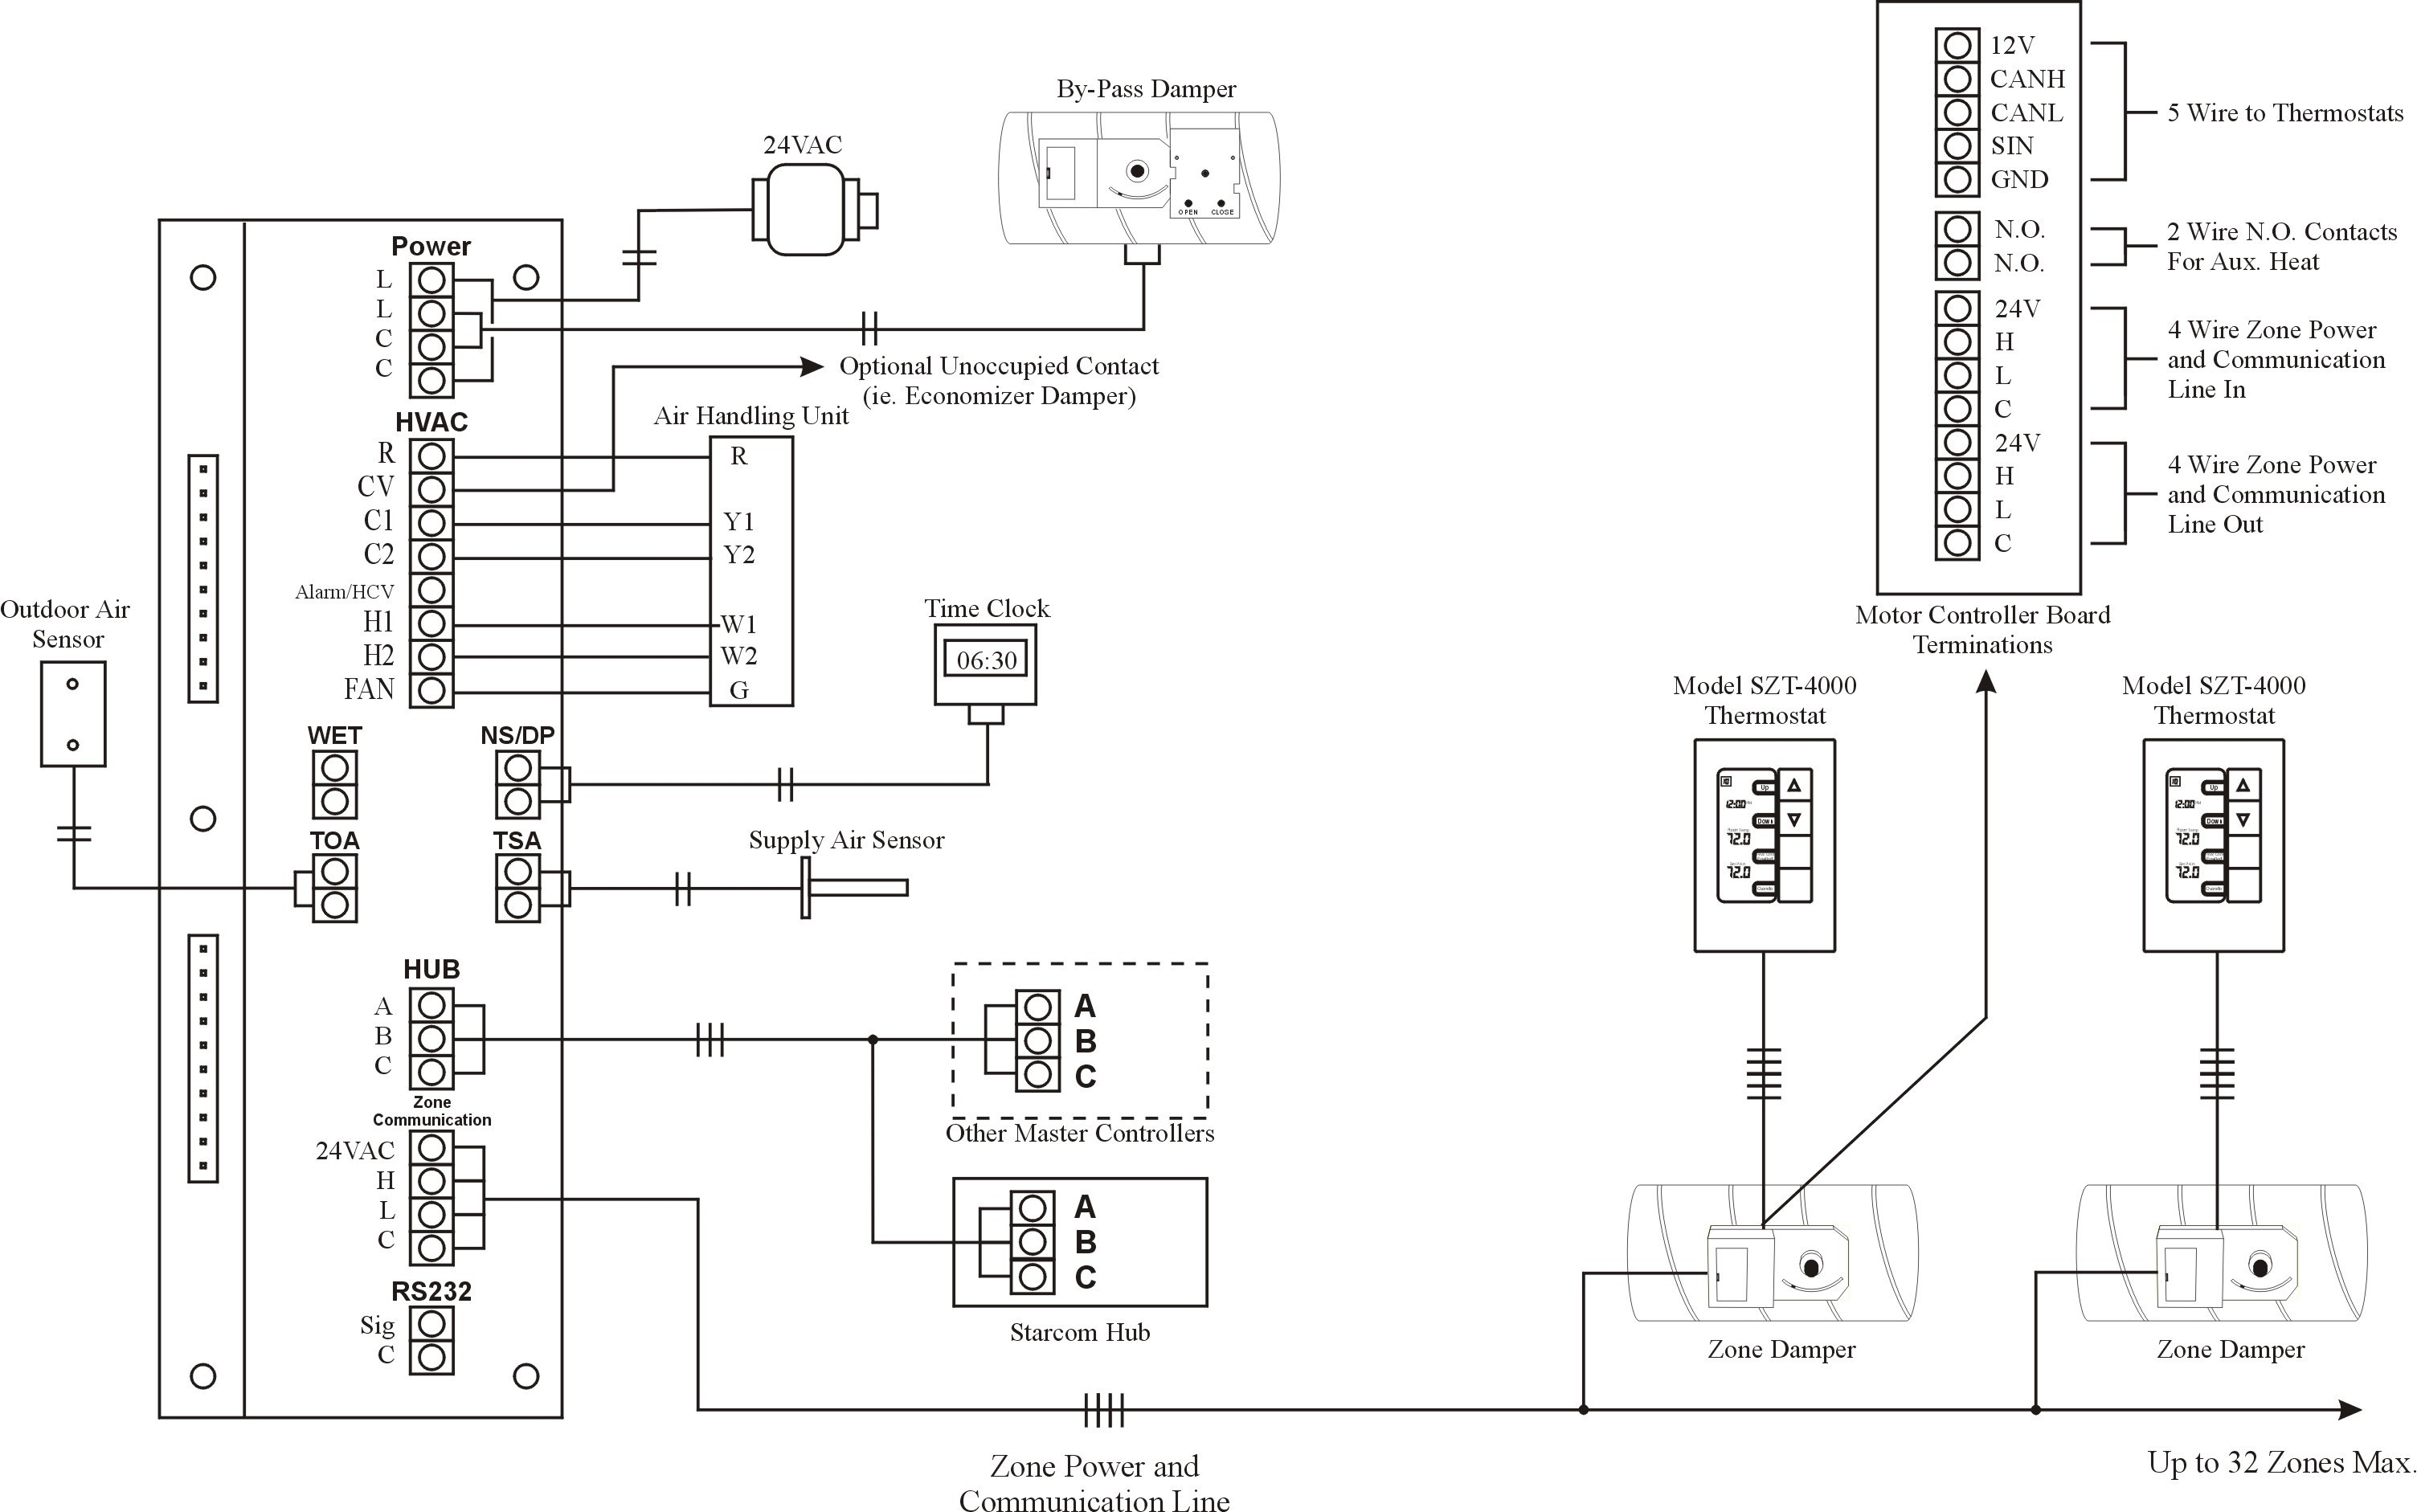 honeywell dual fuel thermostat wiring diagram